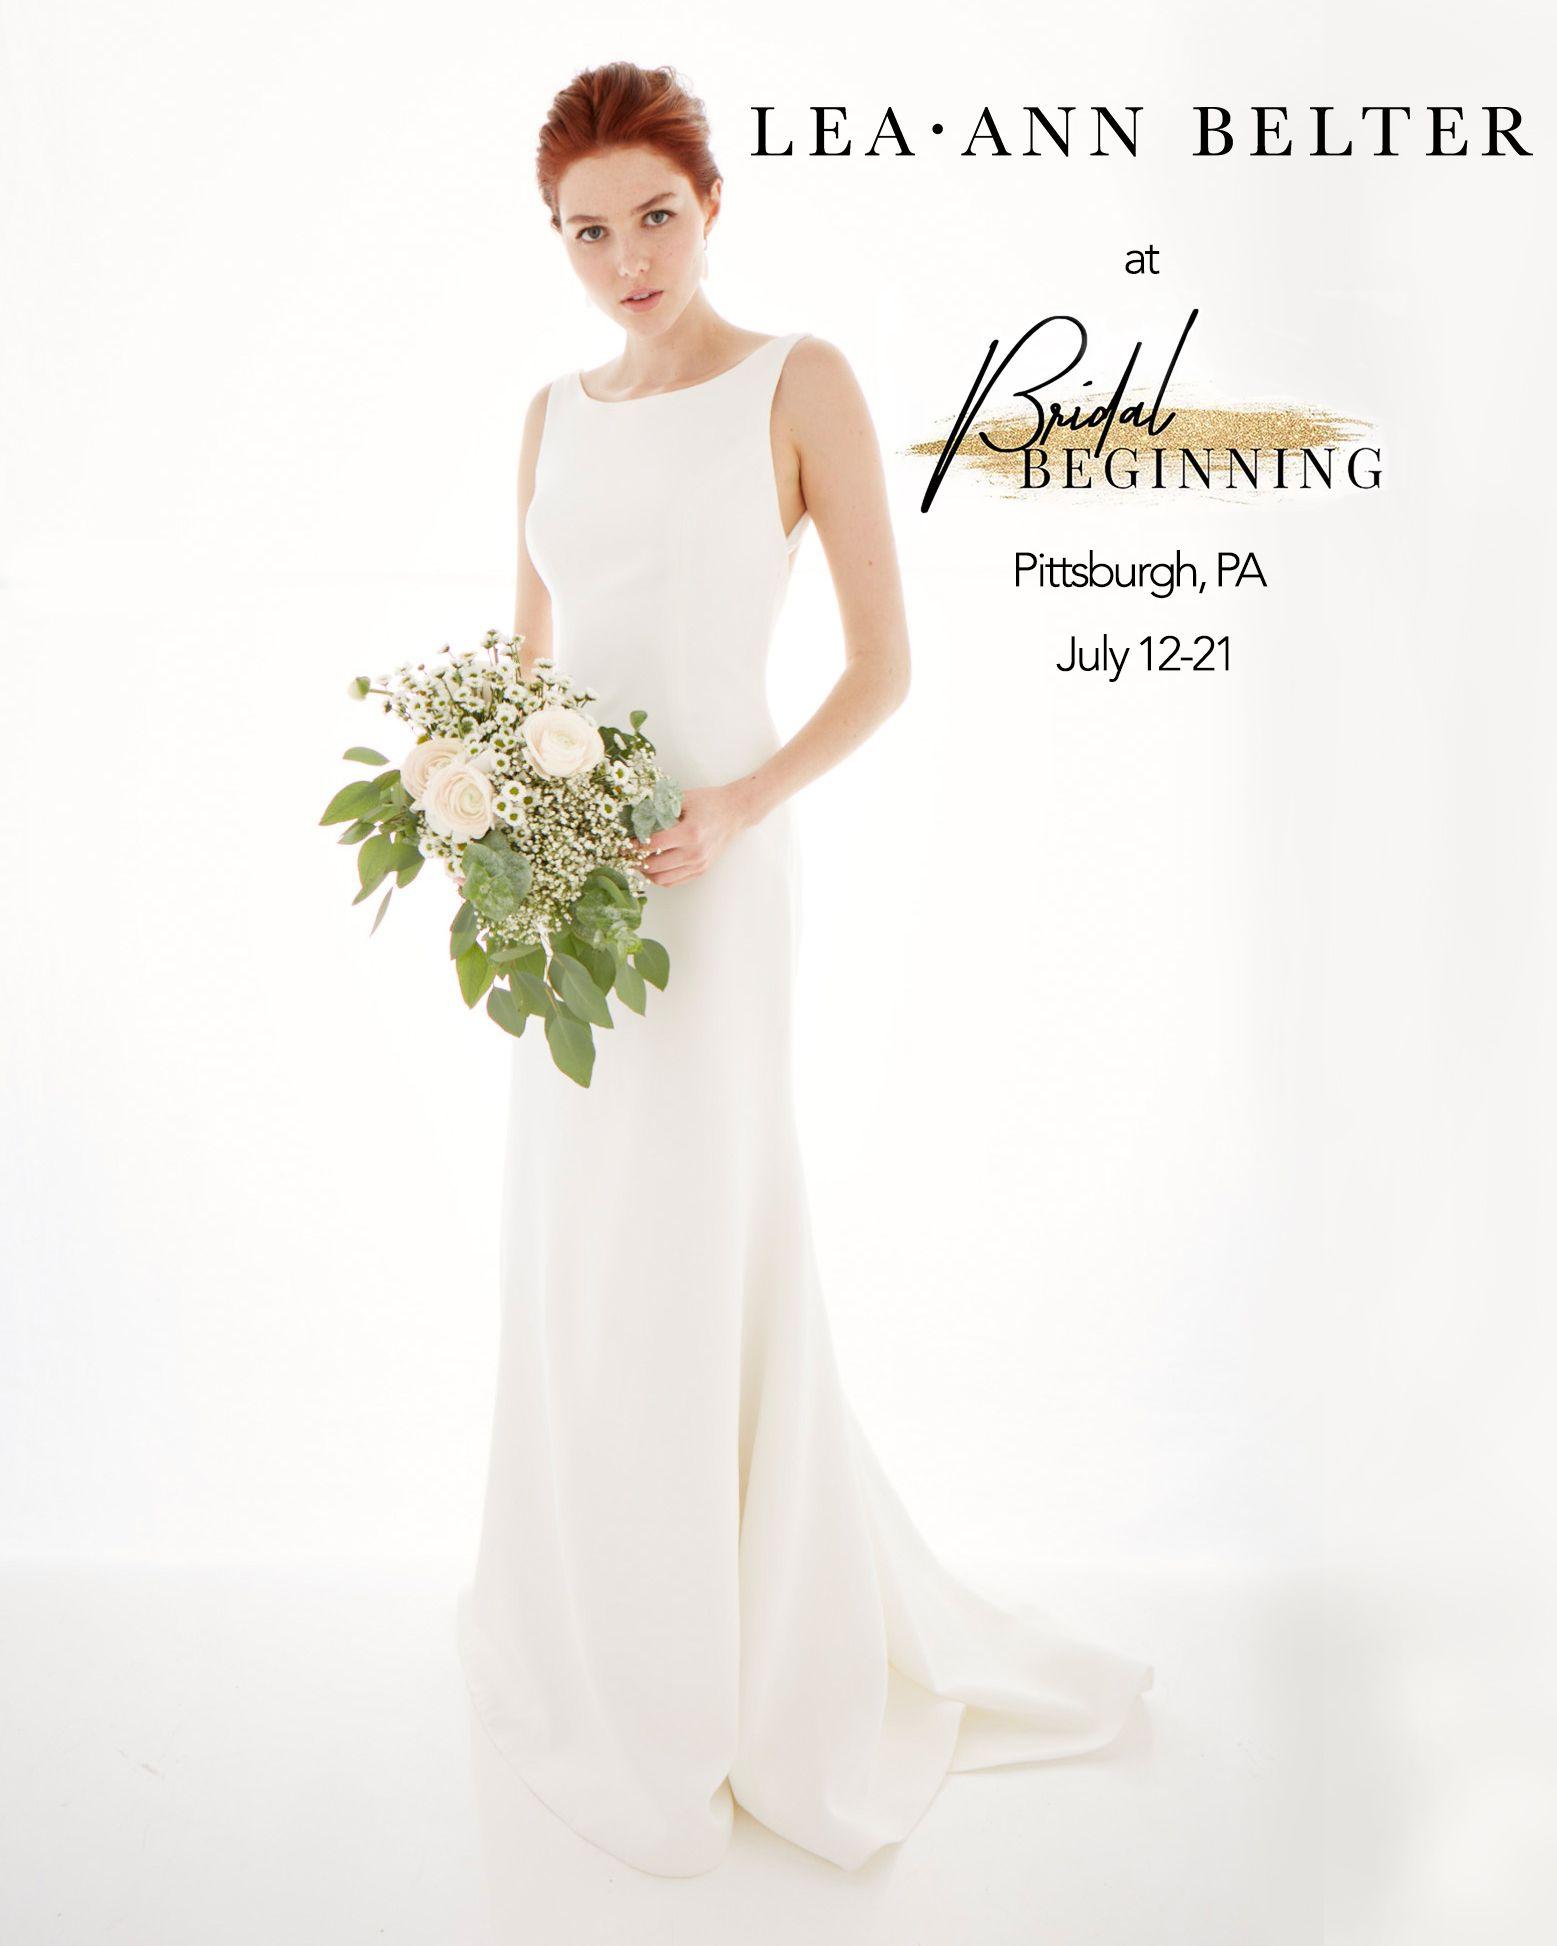 Pittsburgh Bridal Gown Trunk Show Bridal Beginning Lea Ann Belter Bridal Wedding Gowns Mermaid Pink Wedding Dresses